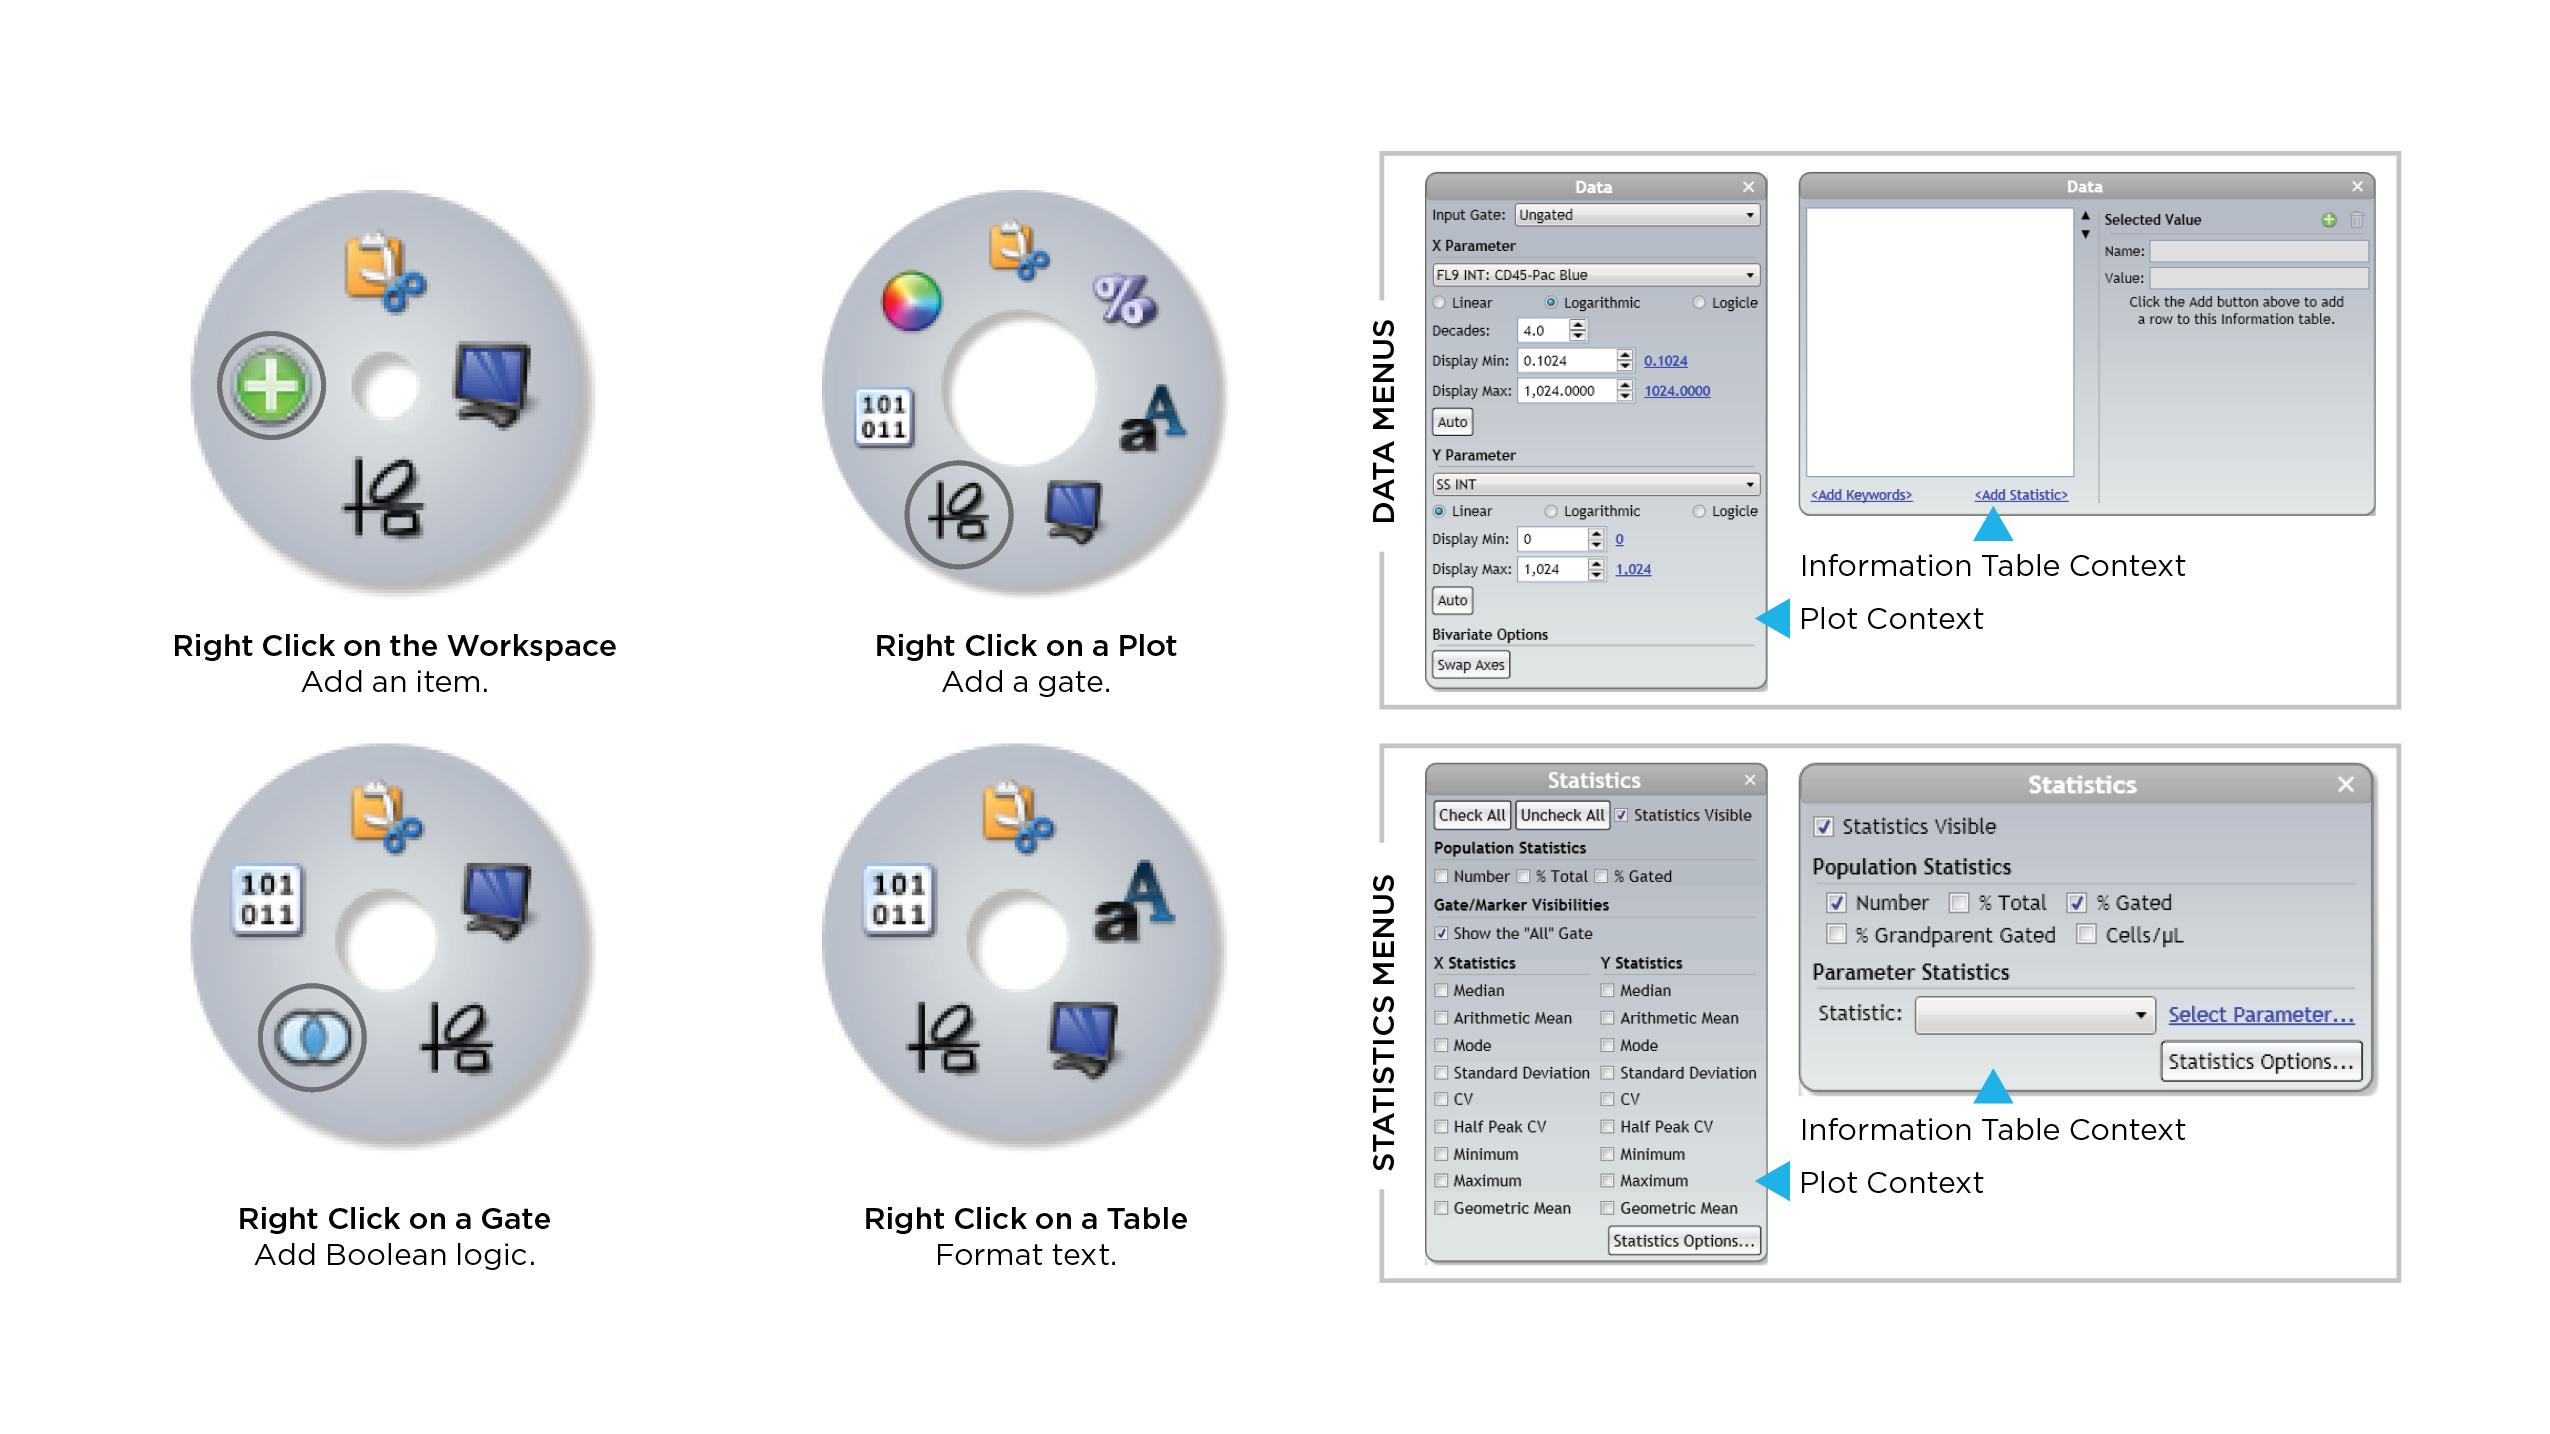 Menus contextuels radiaux du logiciel Kaluza Analysis